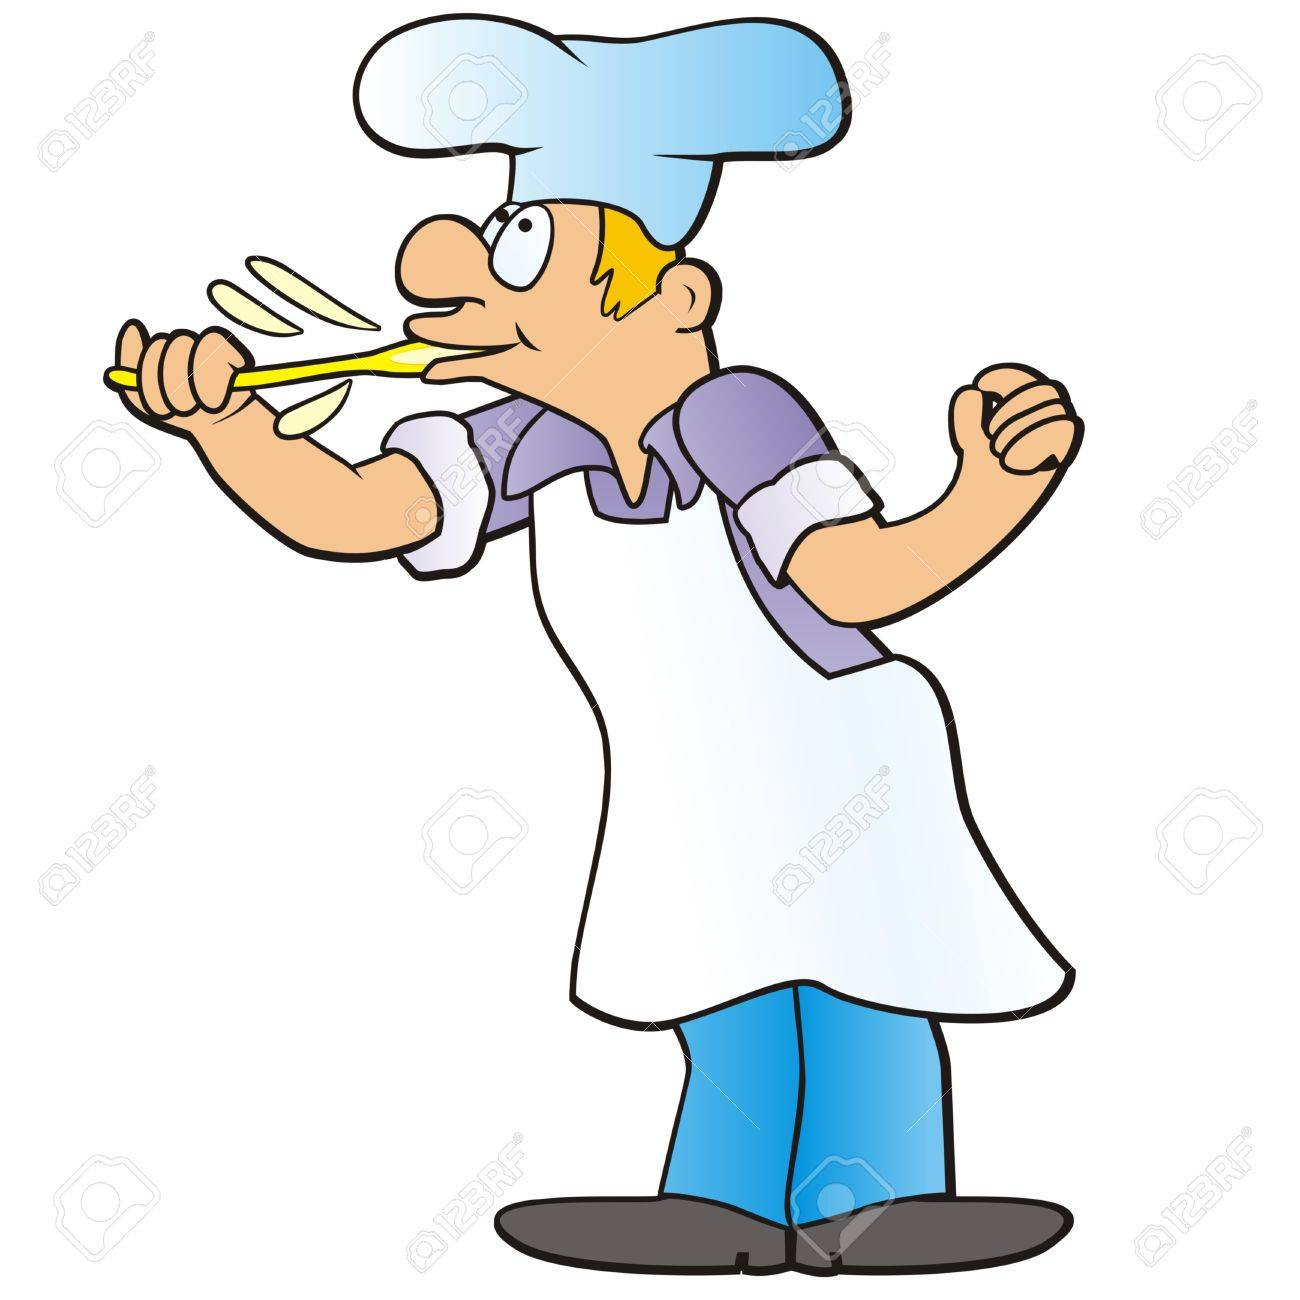 cook - man Stock Vector - 21956670